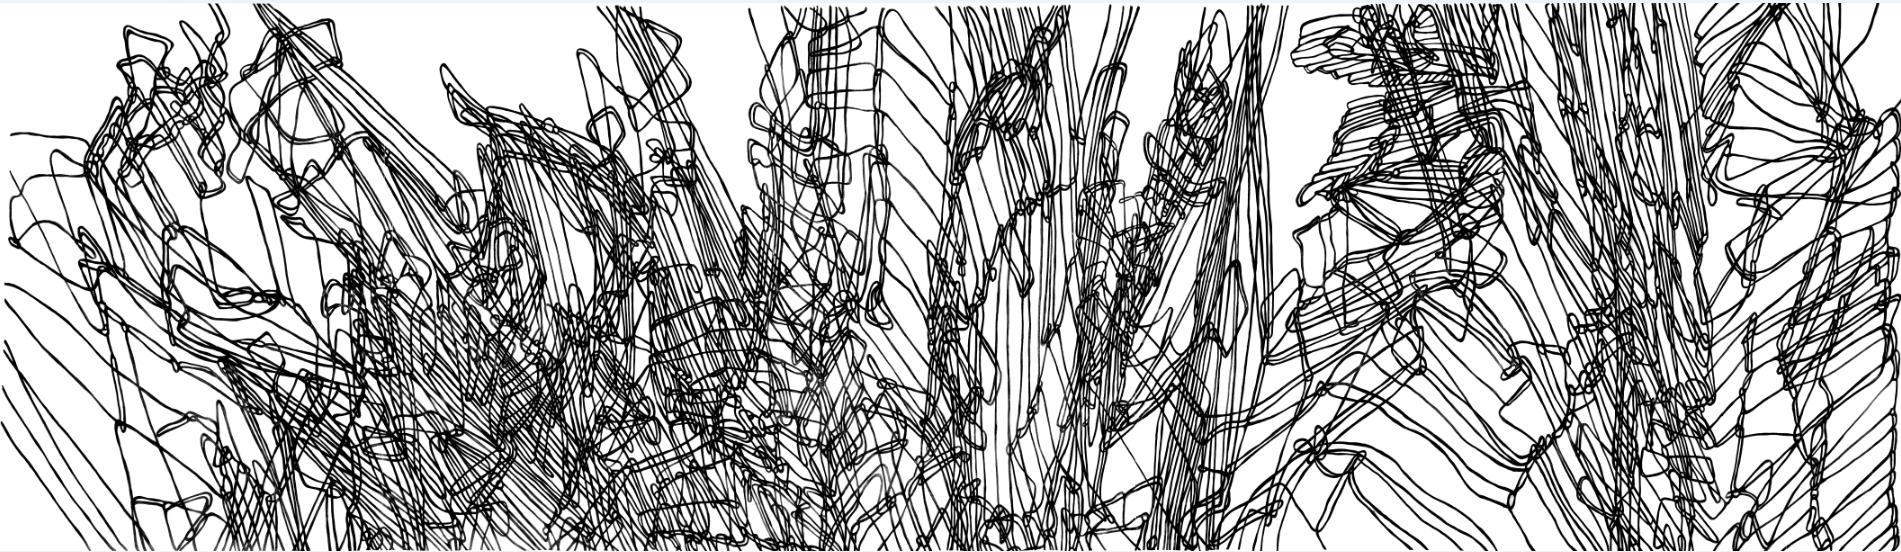 black and white lines, Hannah Quinlivan artwork